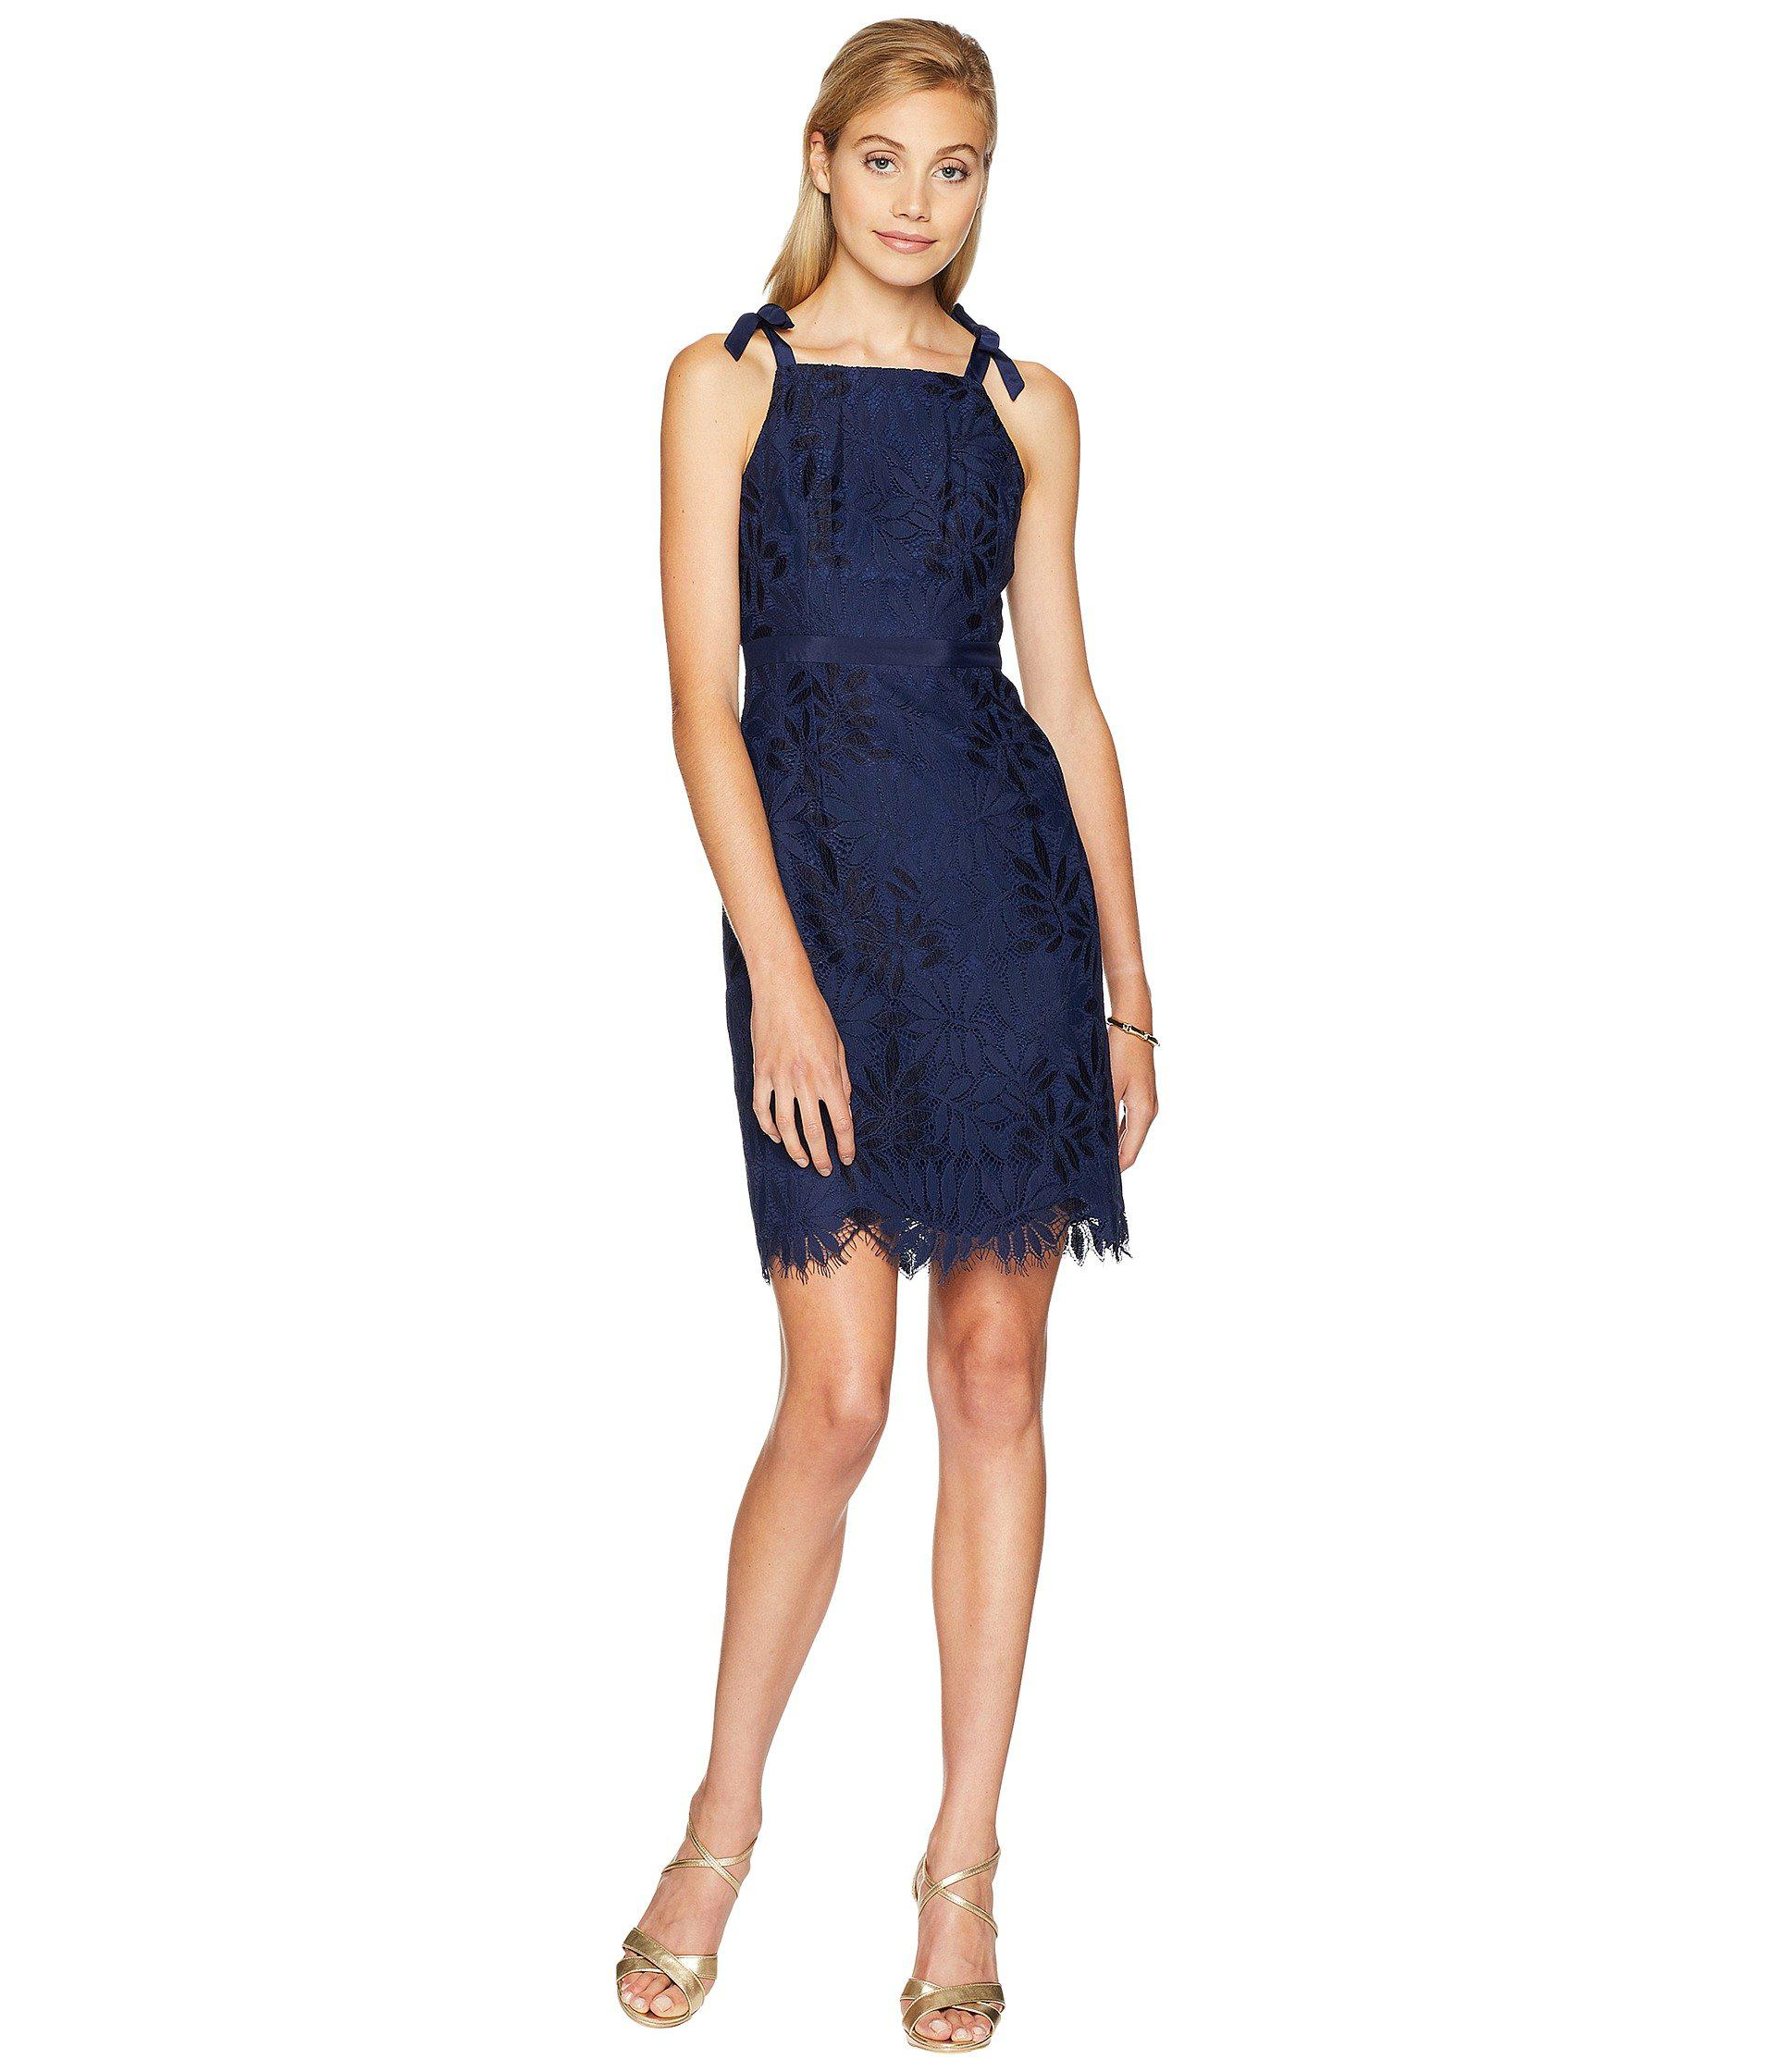 83f6defb7a80 Lyst - Lilly Pulitzer Kayleigh Shift Dress (tidal Wave Fern Gallery ...